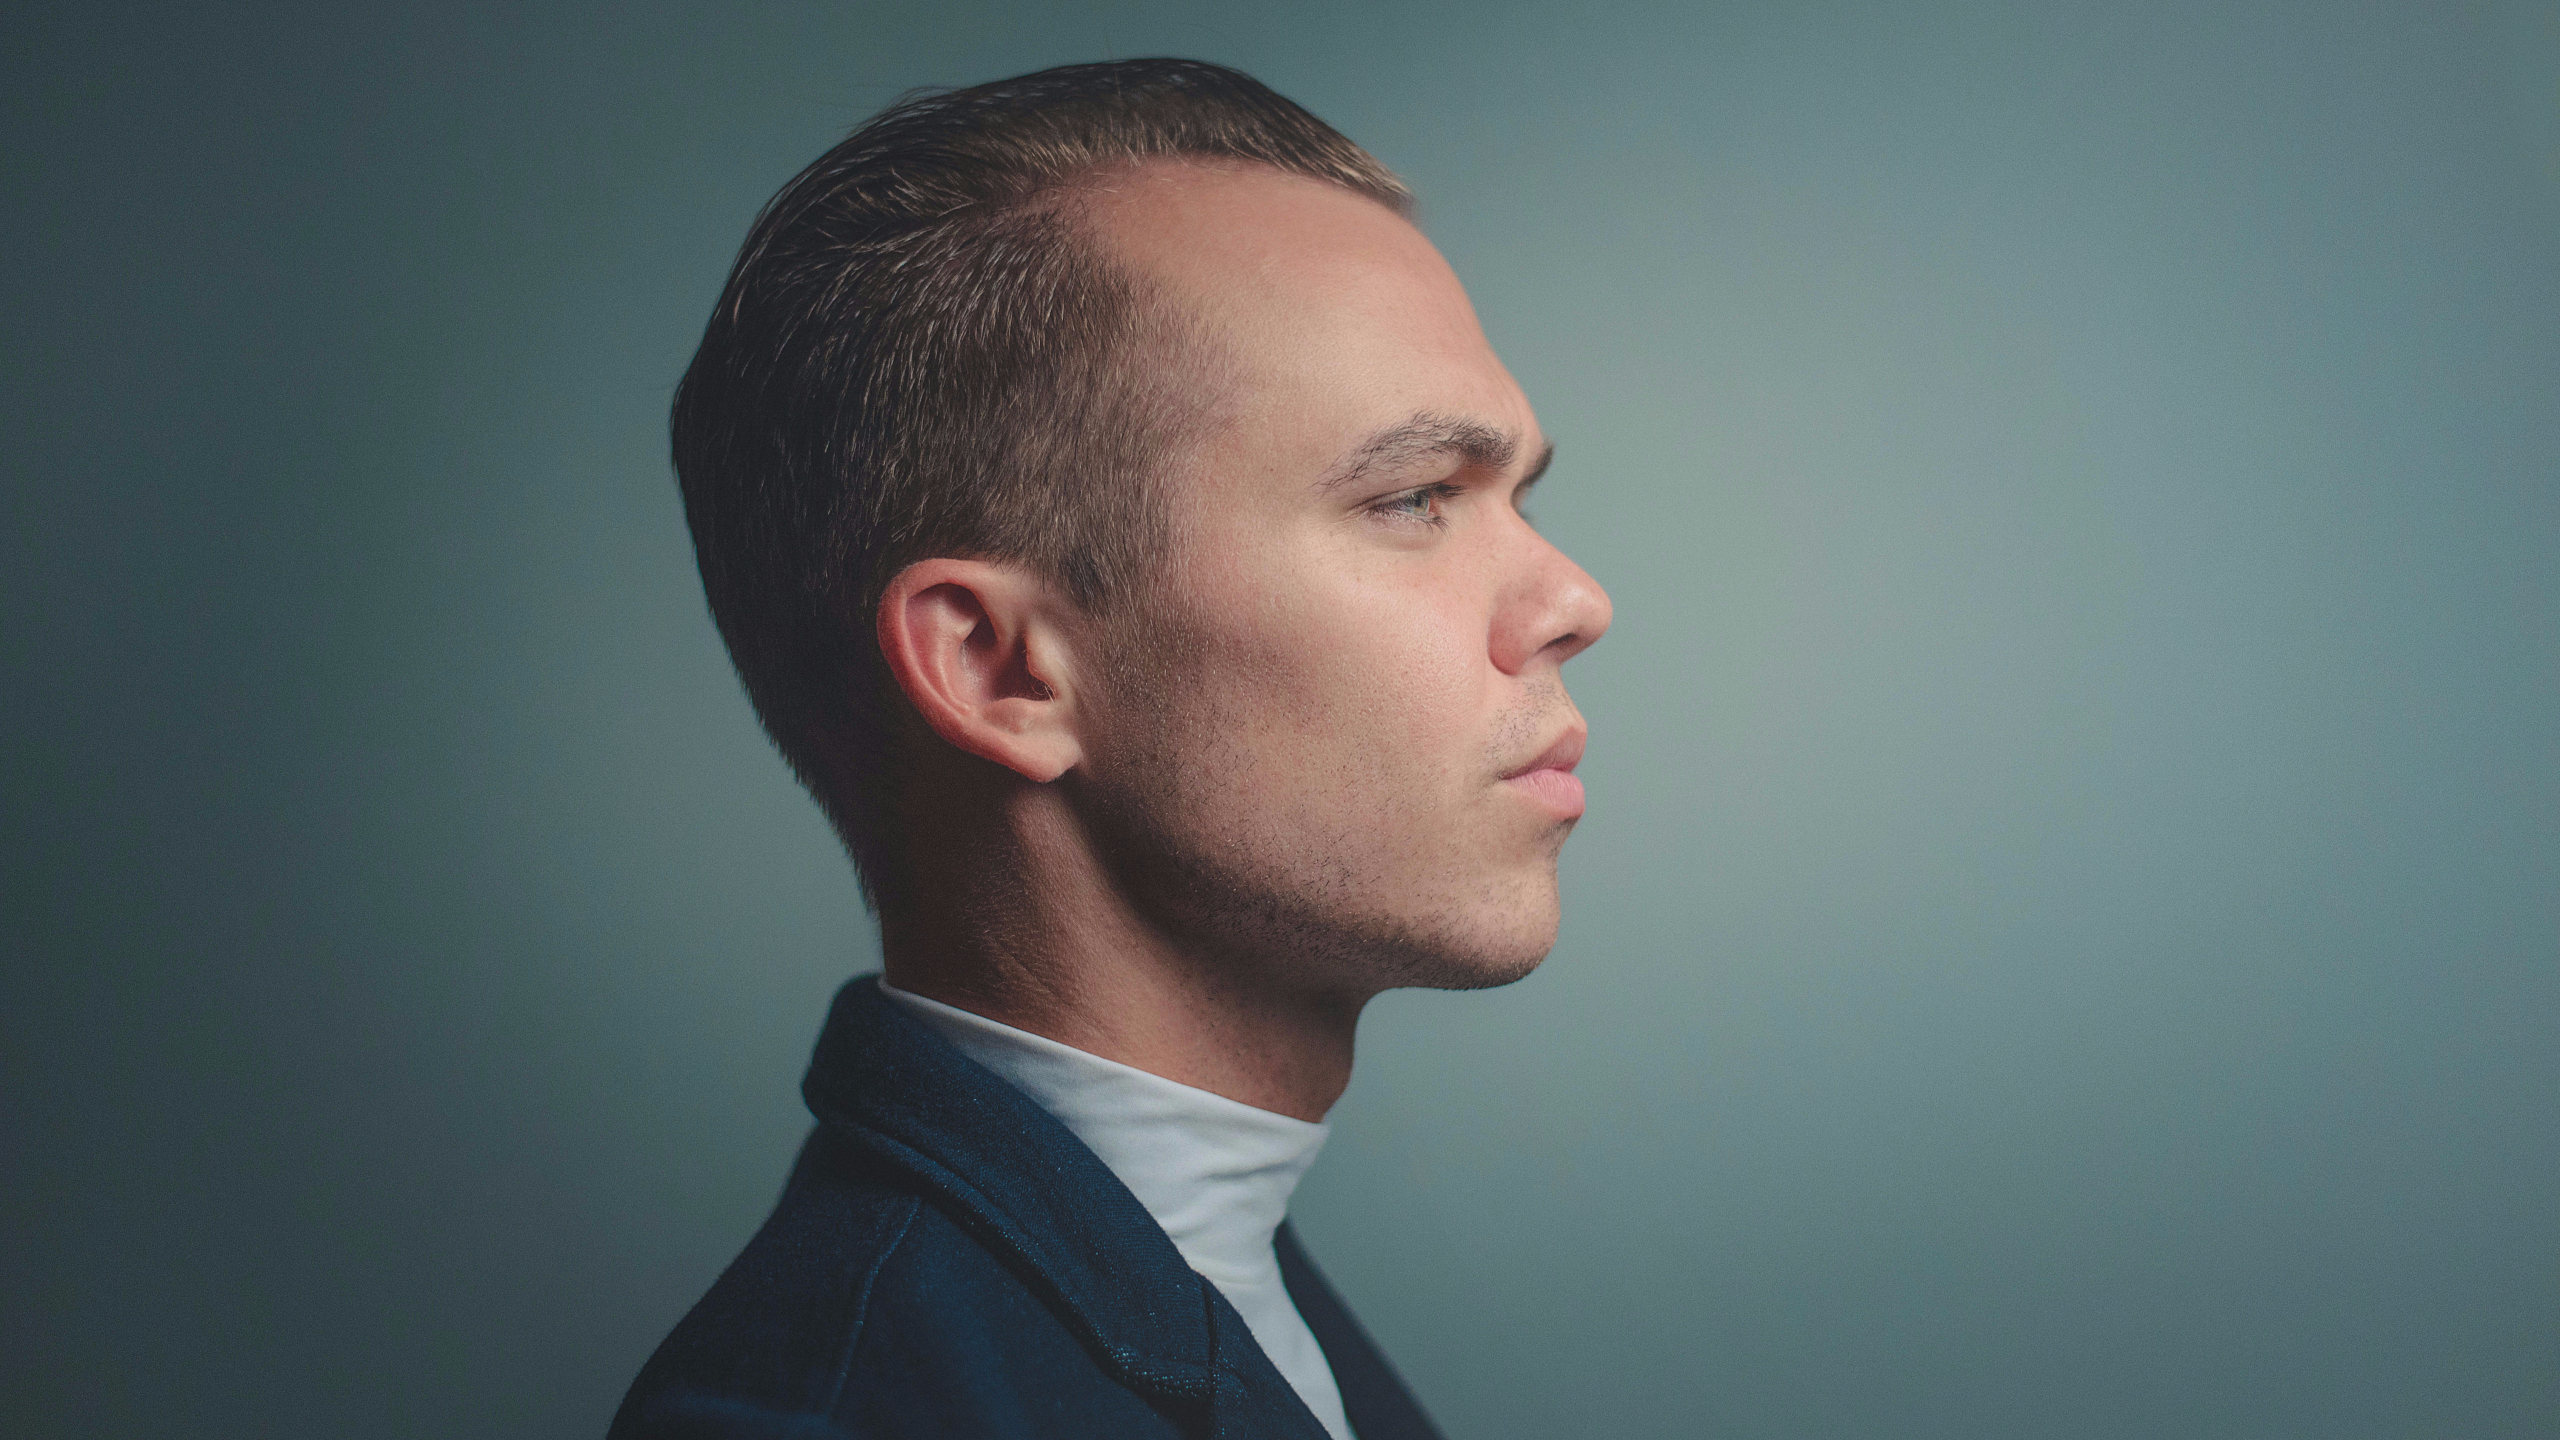 Male facebook profile photos